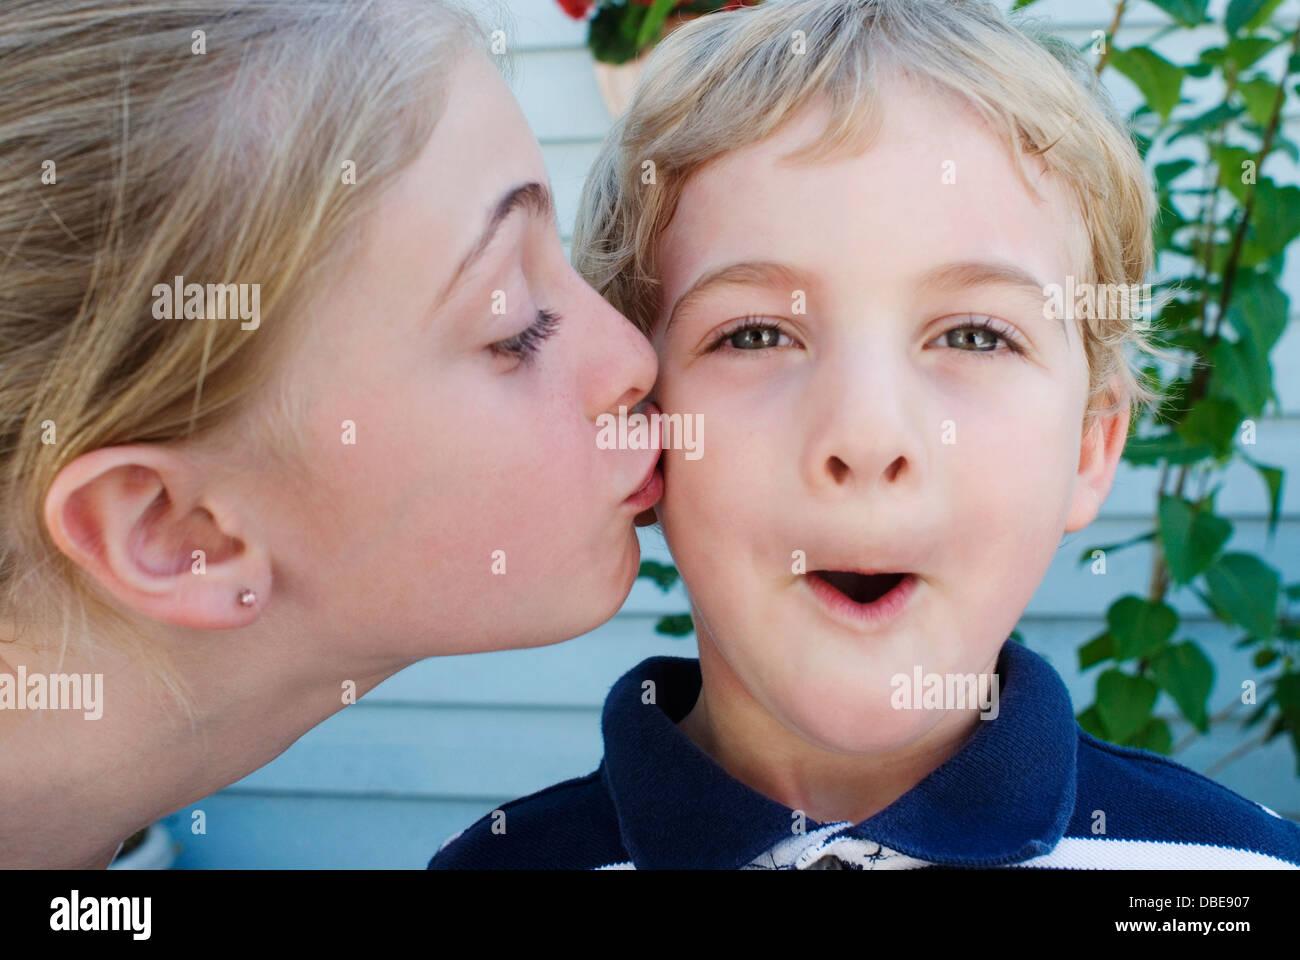 Boy Girl Kiss Children Stock Photos  Boy Girl Kiss Children Stock Images - Alamy-9489